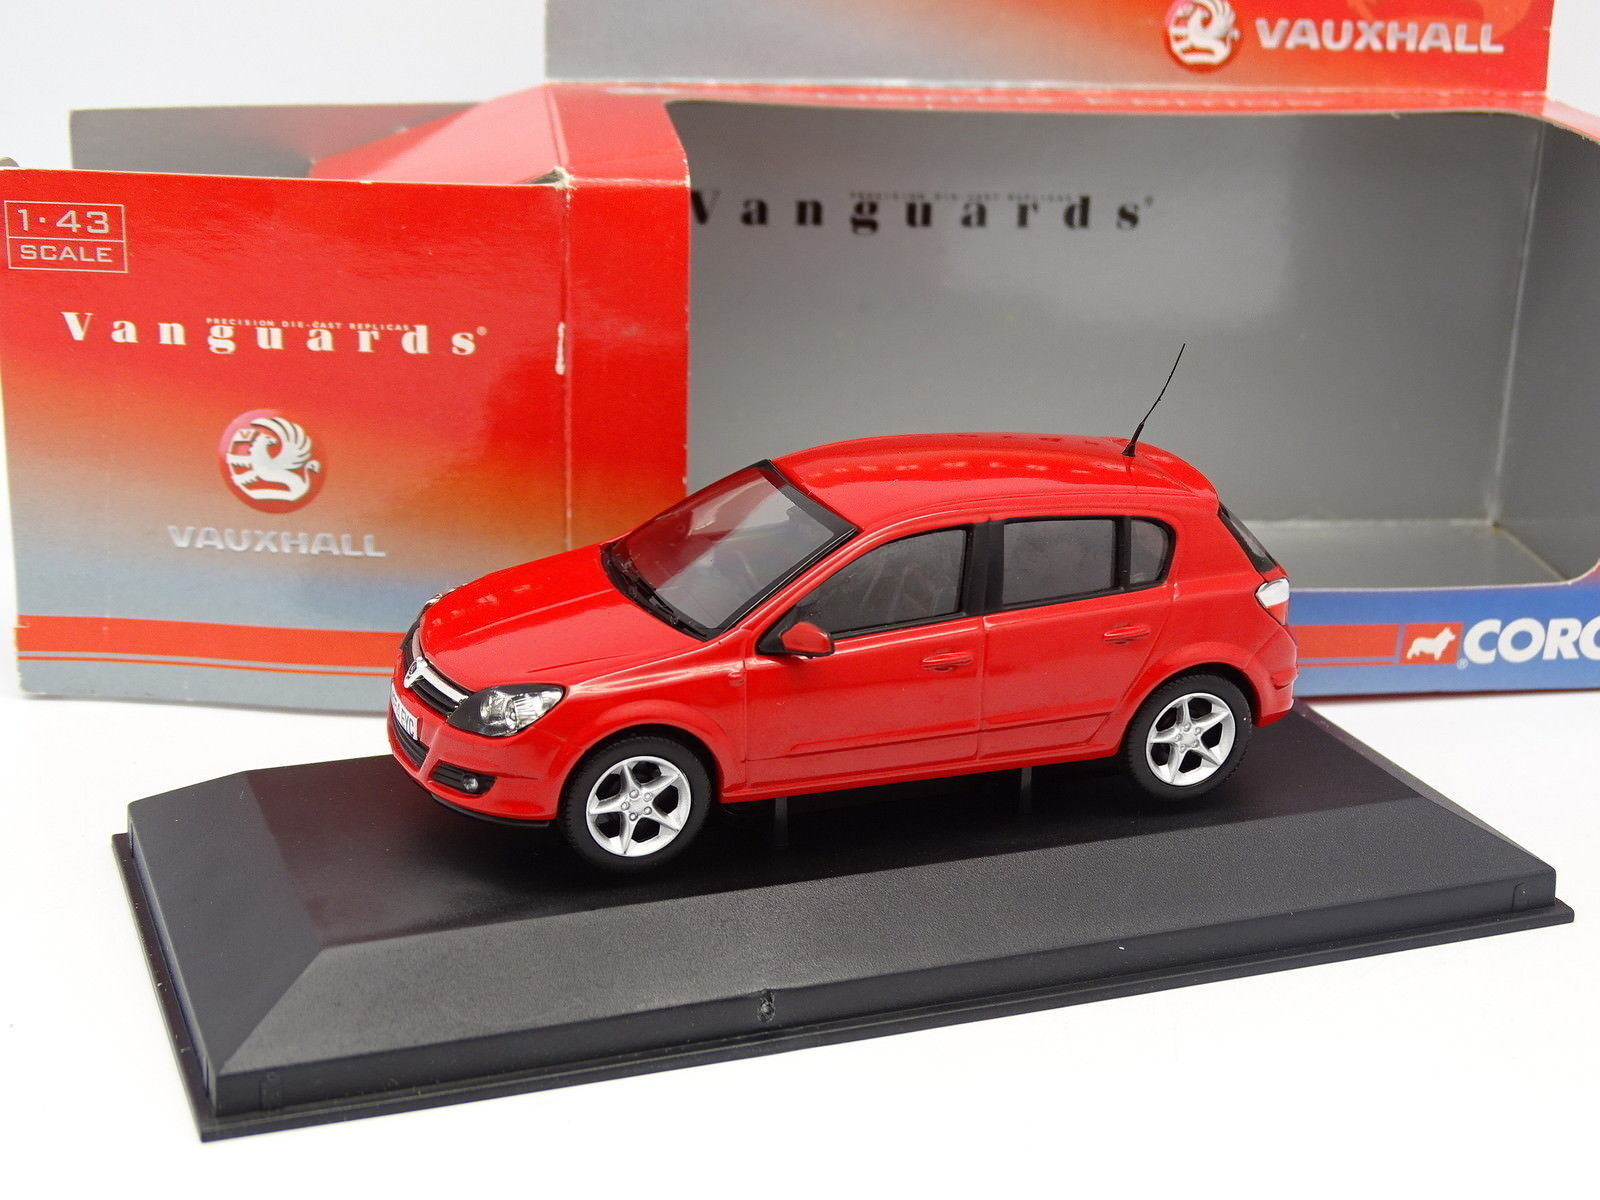 hasta un 50% de descuento Vanguardias 1 43 - Vauxhall Vauxhall Vauxhall Astra Rojo  entrega rápida